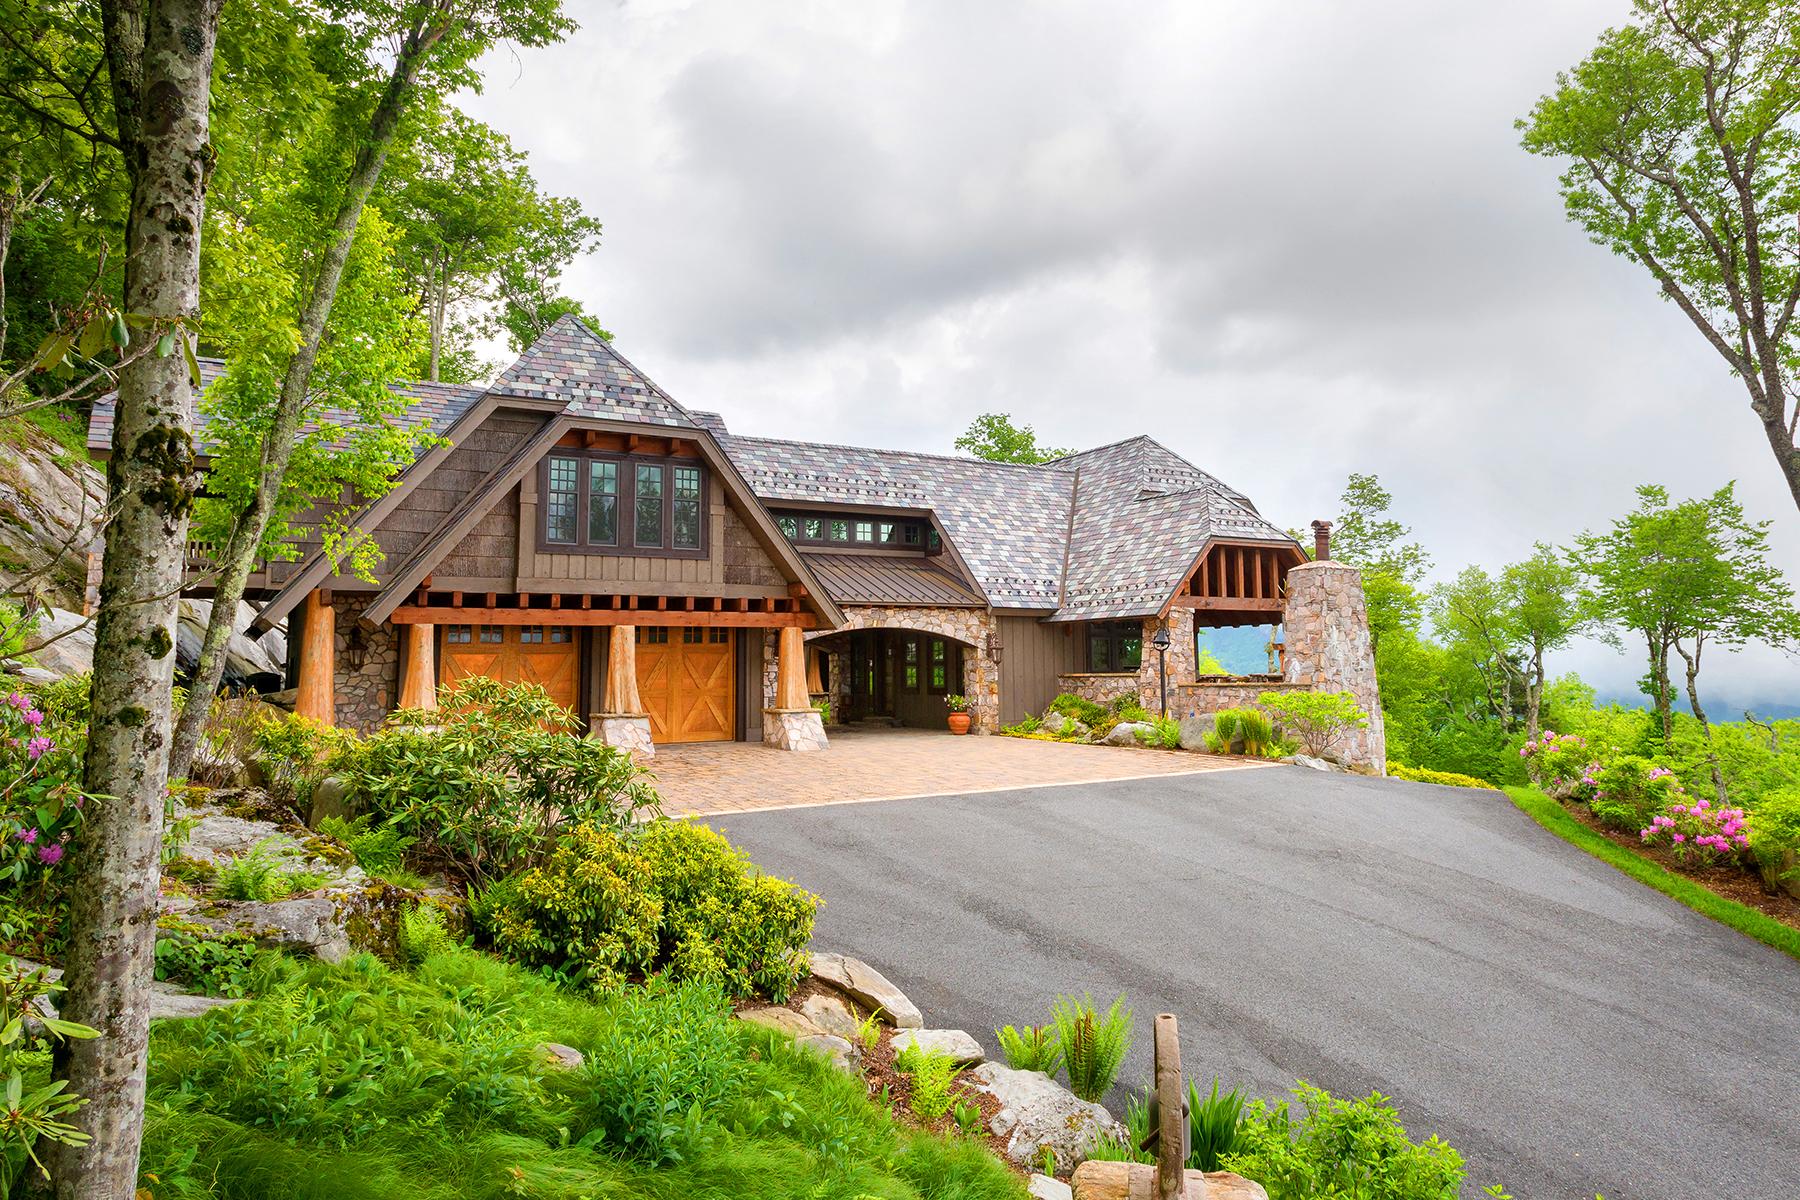 Single Family Home for Sale at LINVILLE - LINVILLE RIDGE 1801 Branlaire Drive 18 Linville, North Carolina, 28646 United States